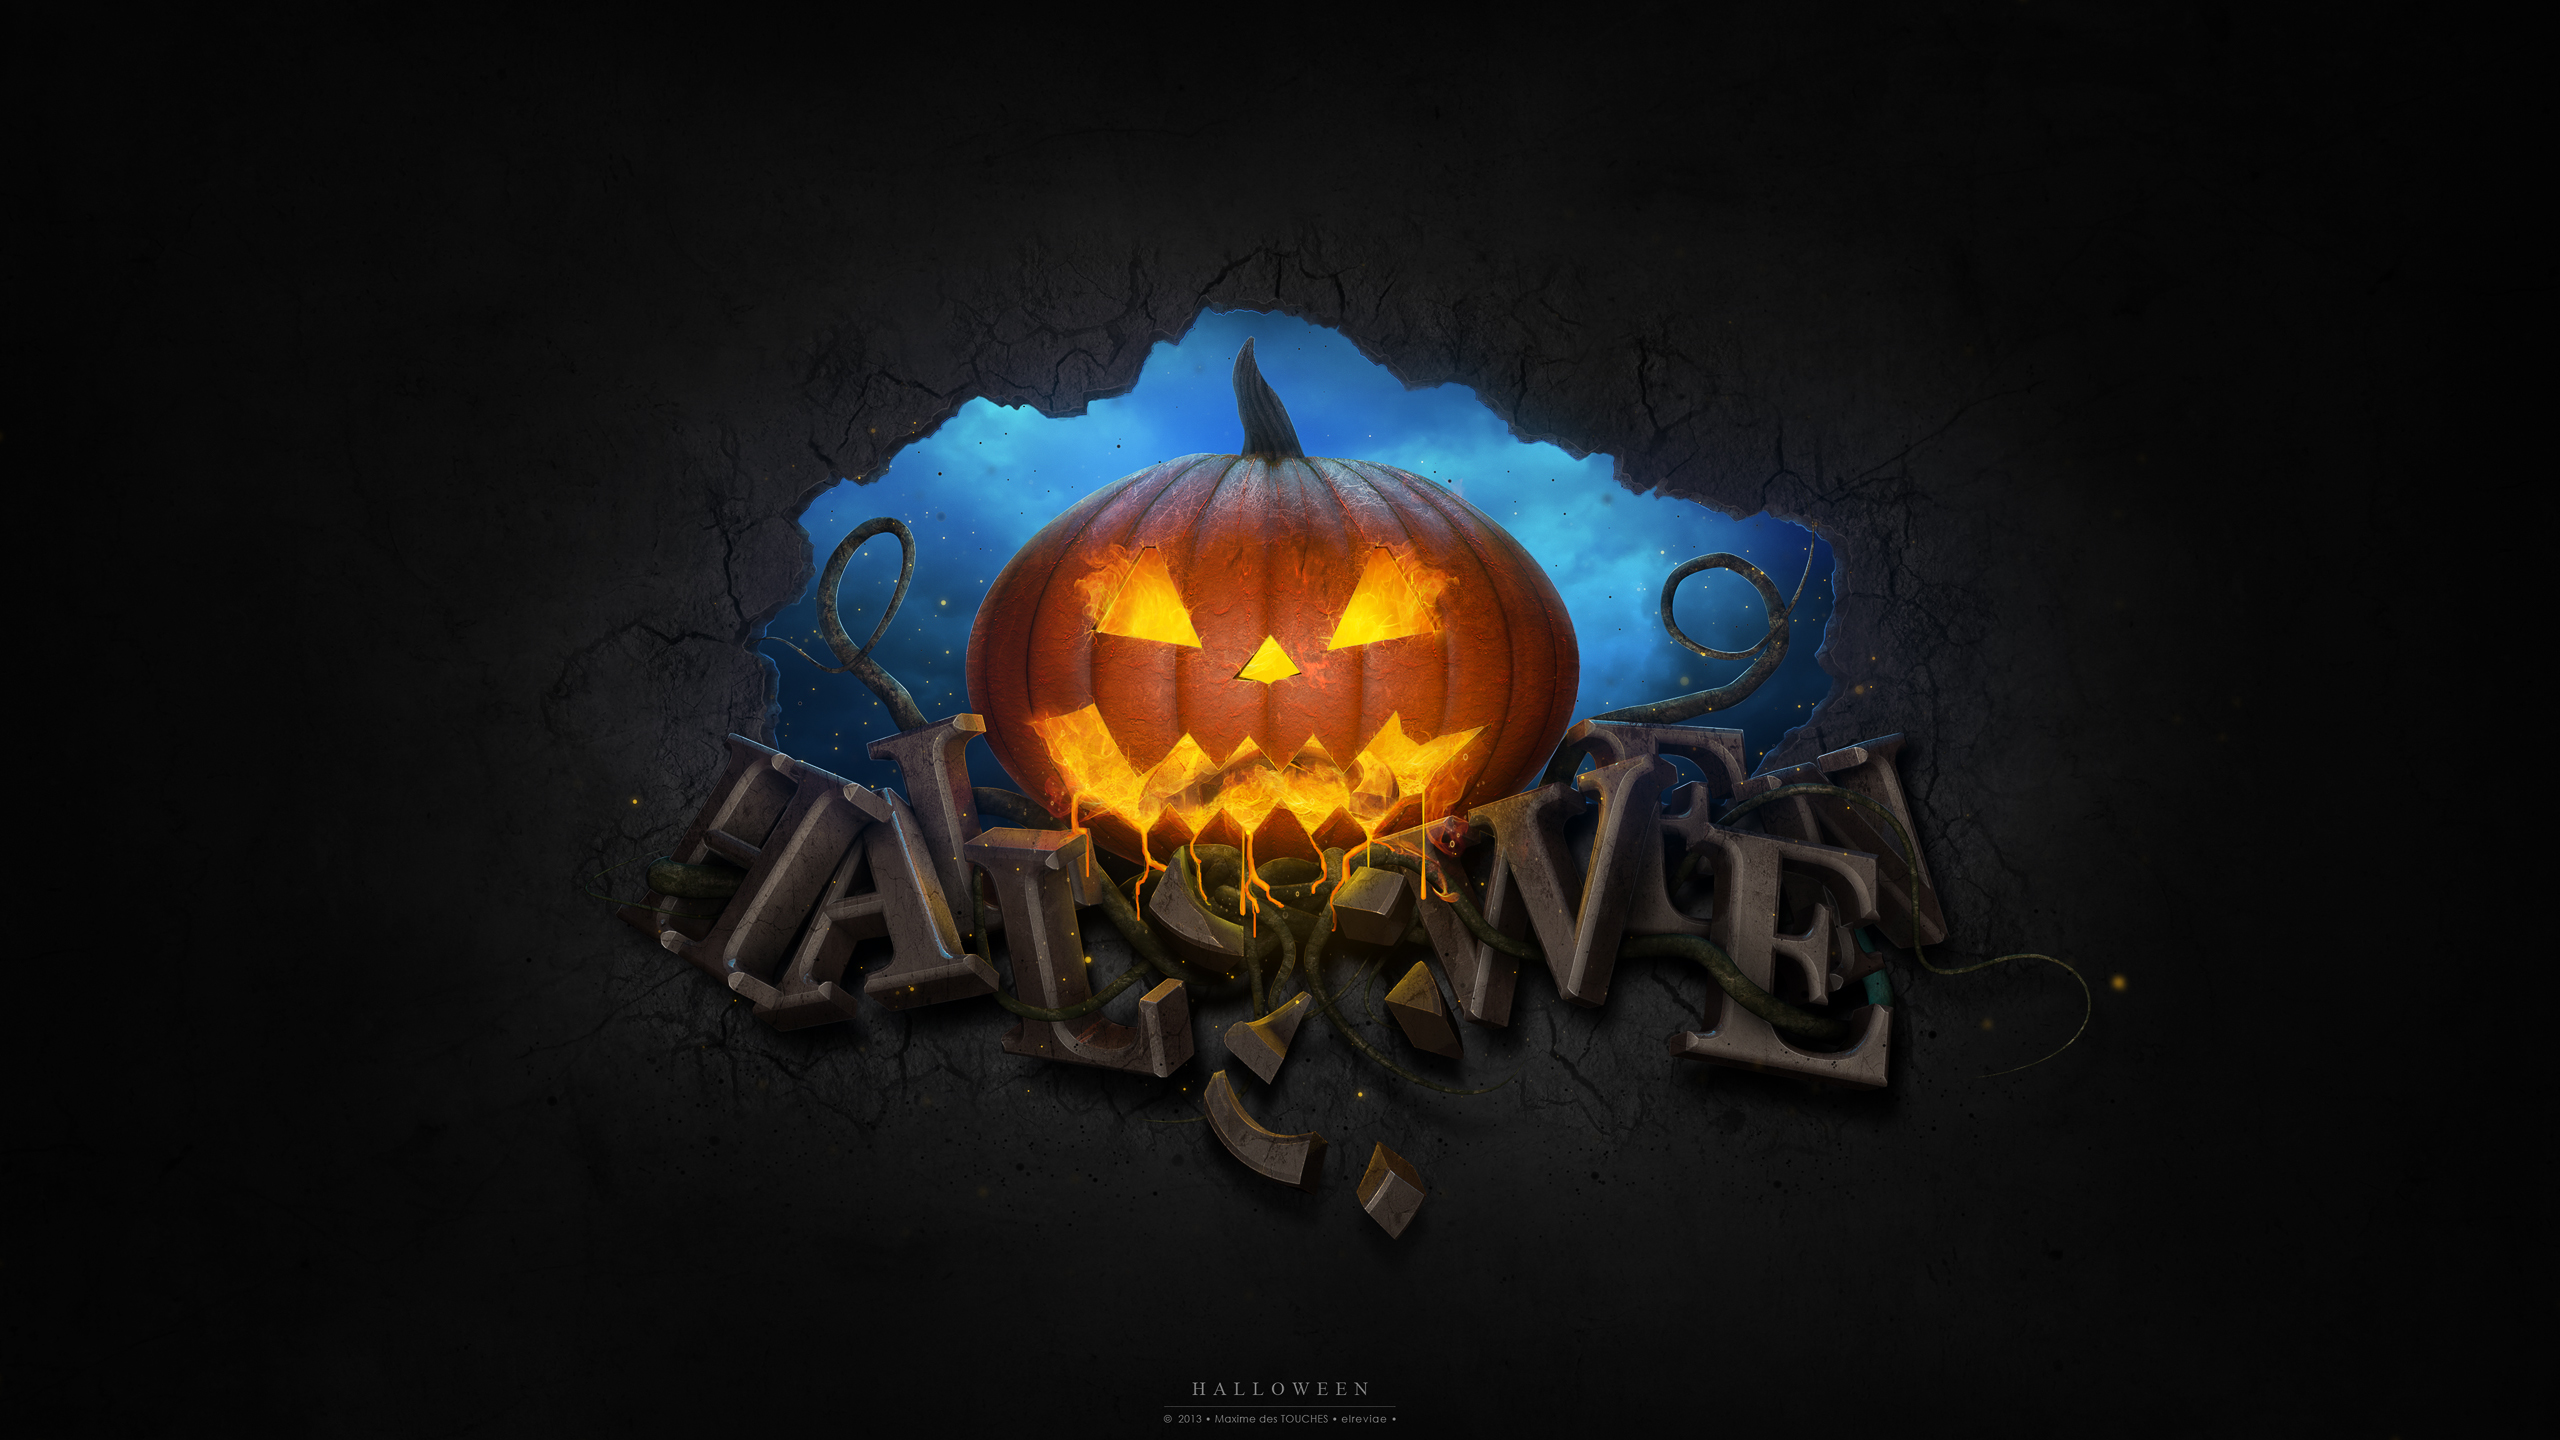 photo pumpkin halloween holidays 2560x1440